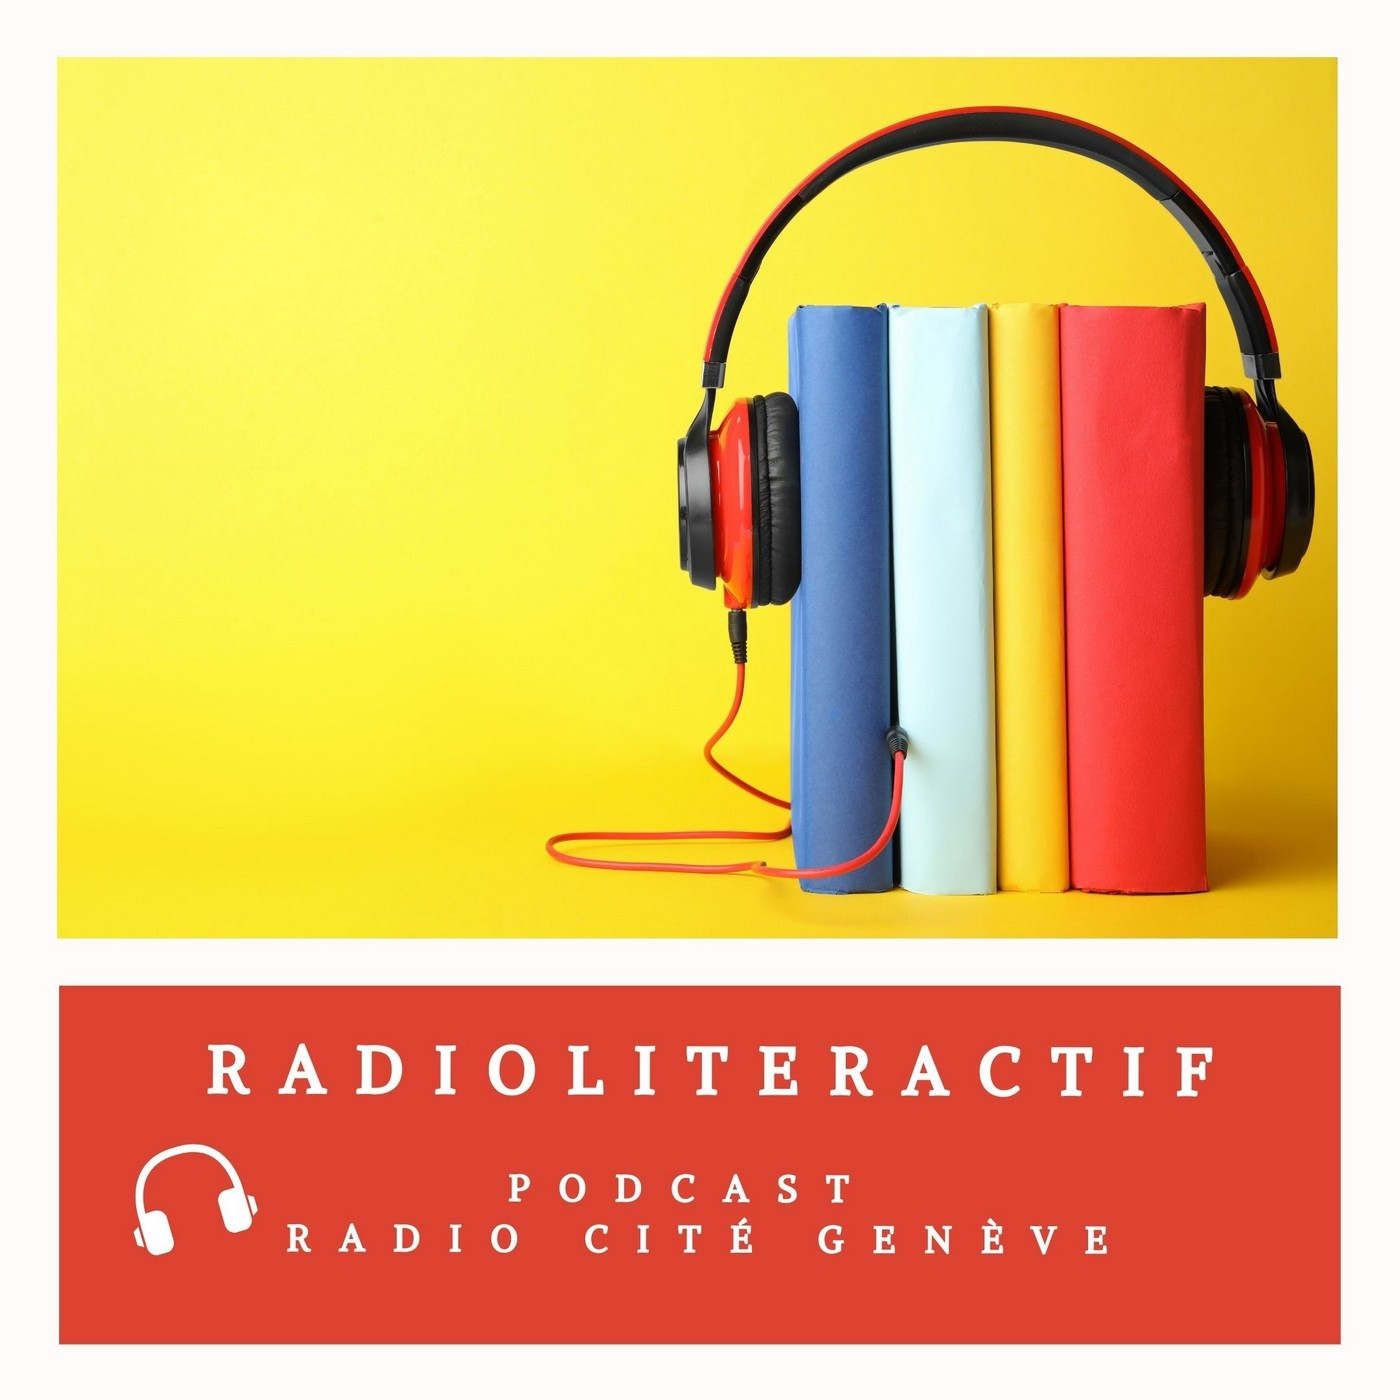 Radioliteractif du 15/03/2021 - Heike Fiedler